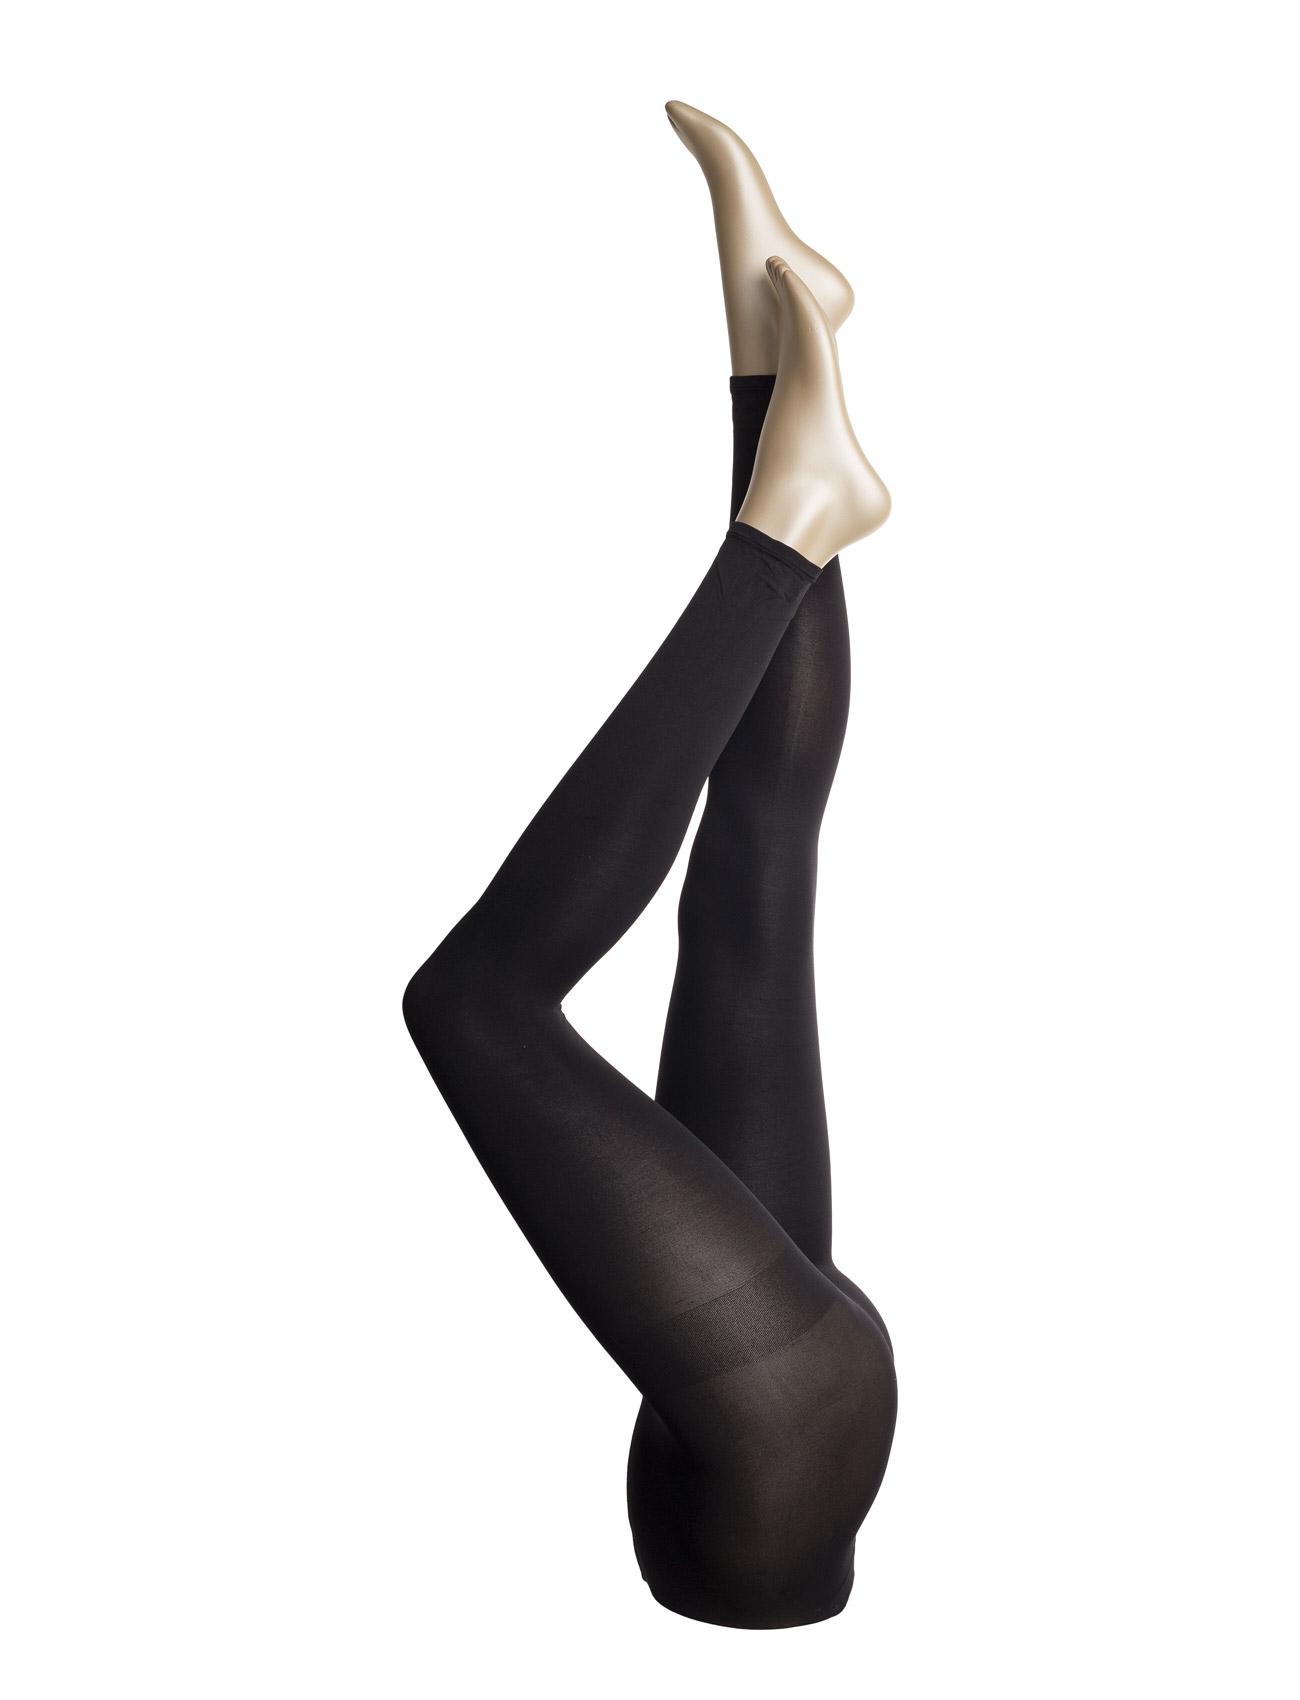 Ladies Den Leggings, Opaque Leggings 3d 80den